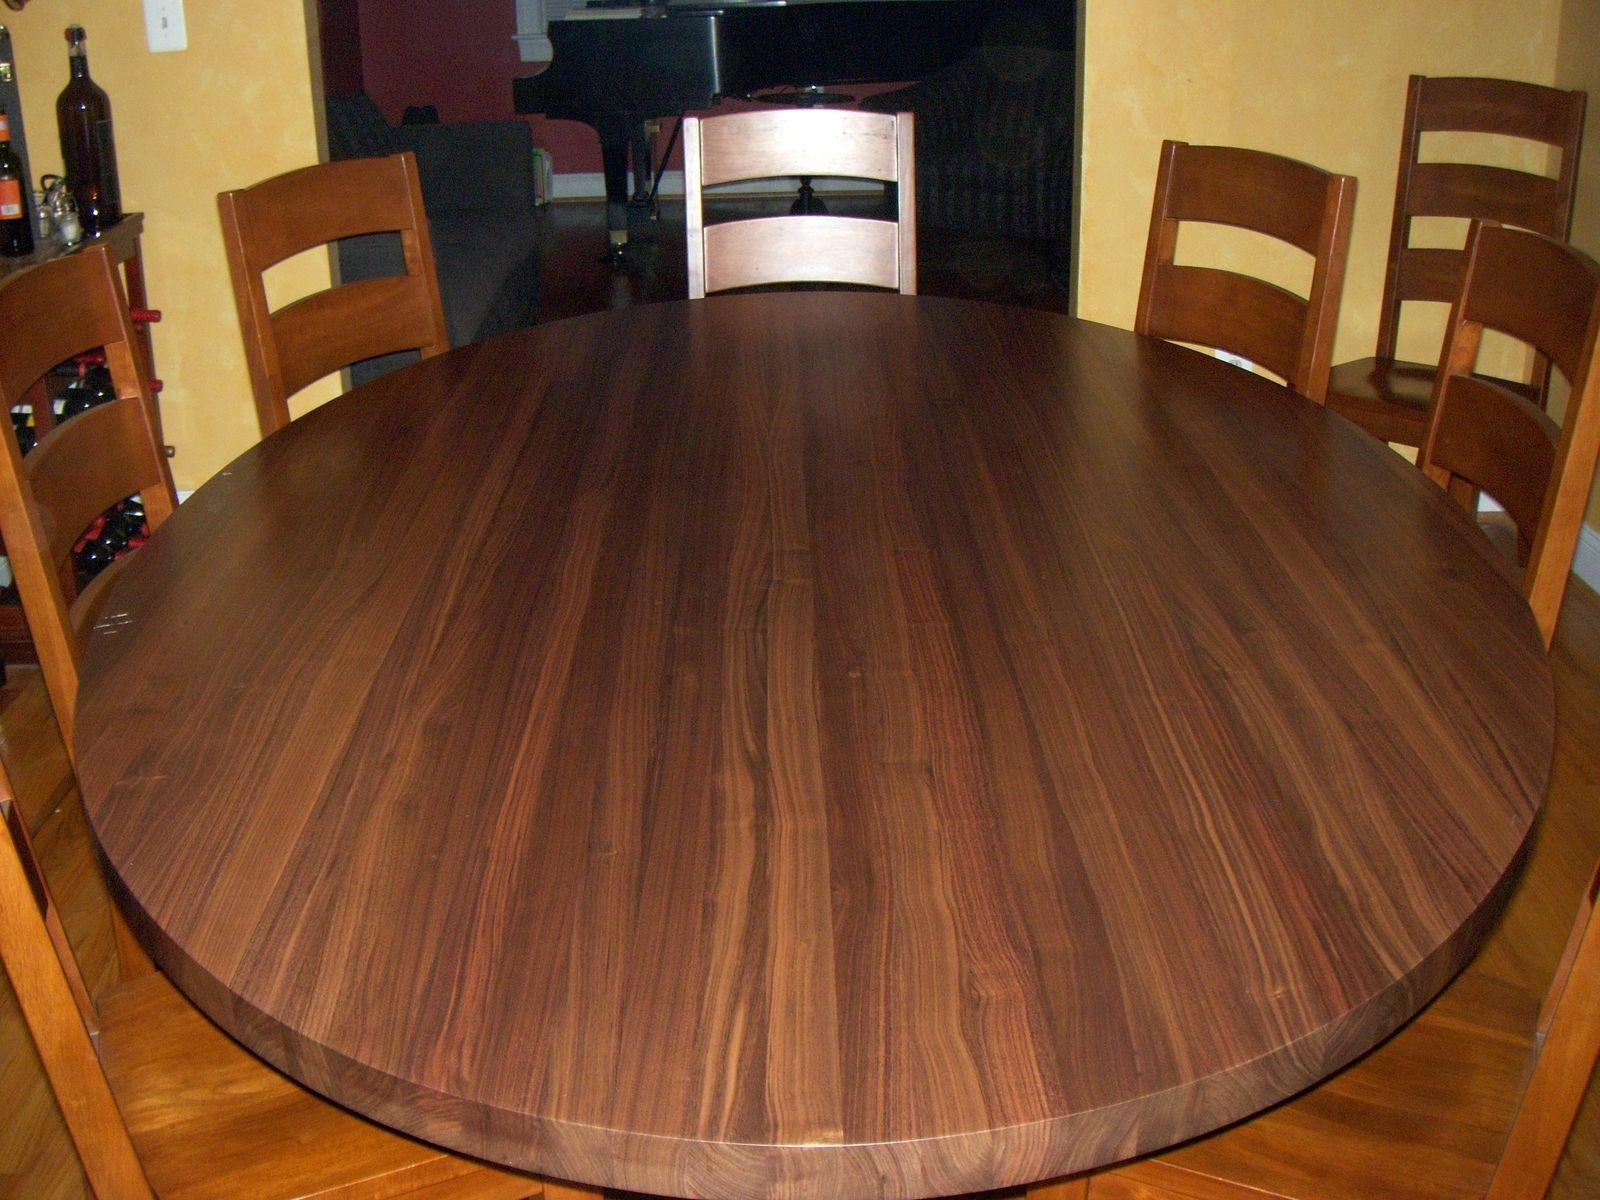 Custom Solid Walnut Table Top By Awp Butcher Block Custommade Com